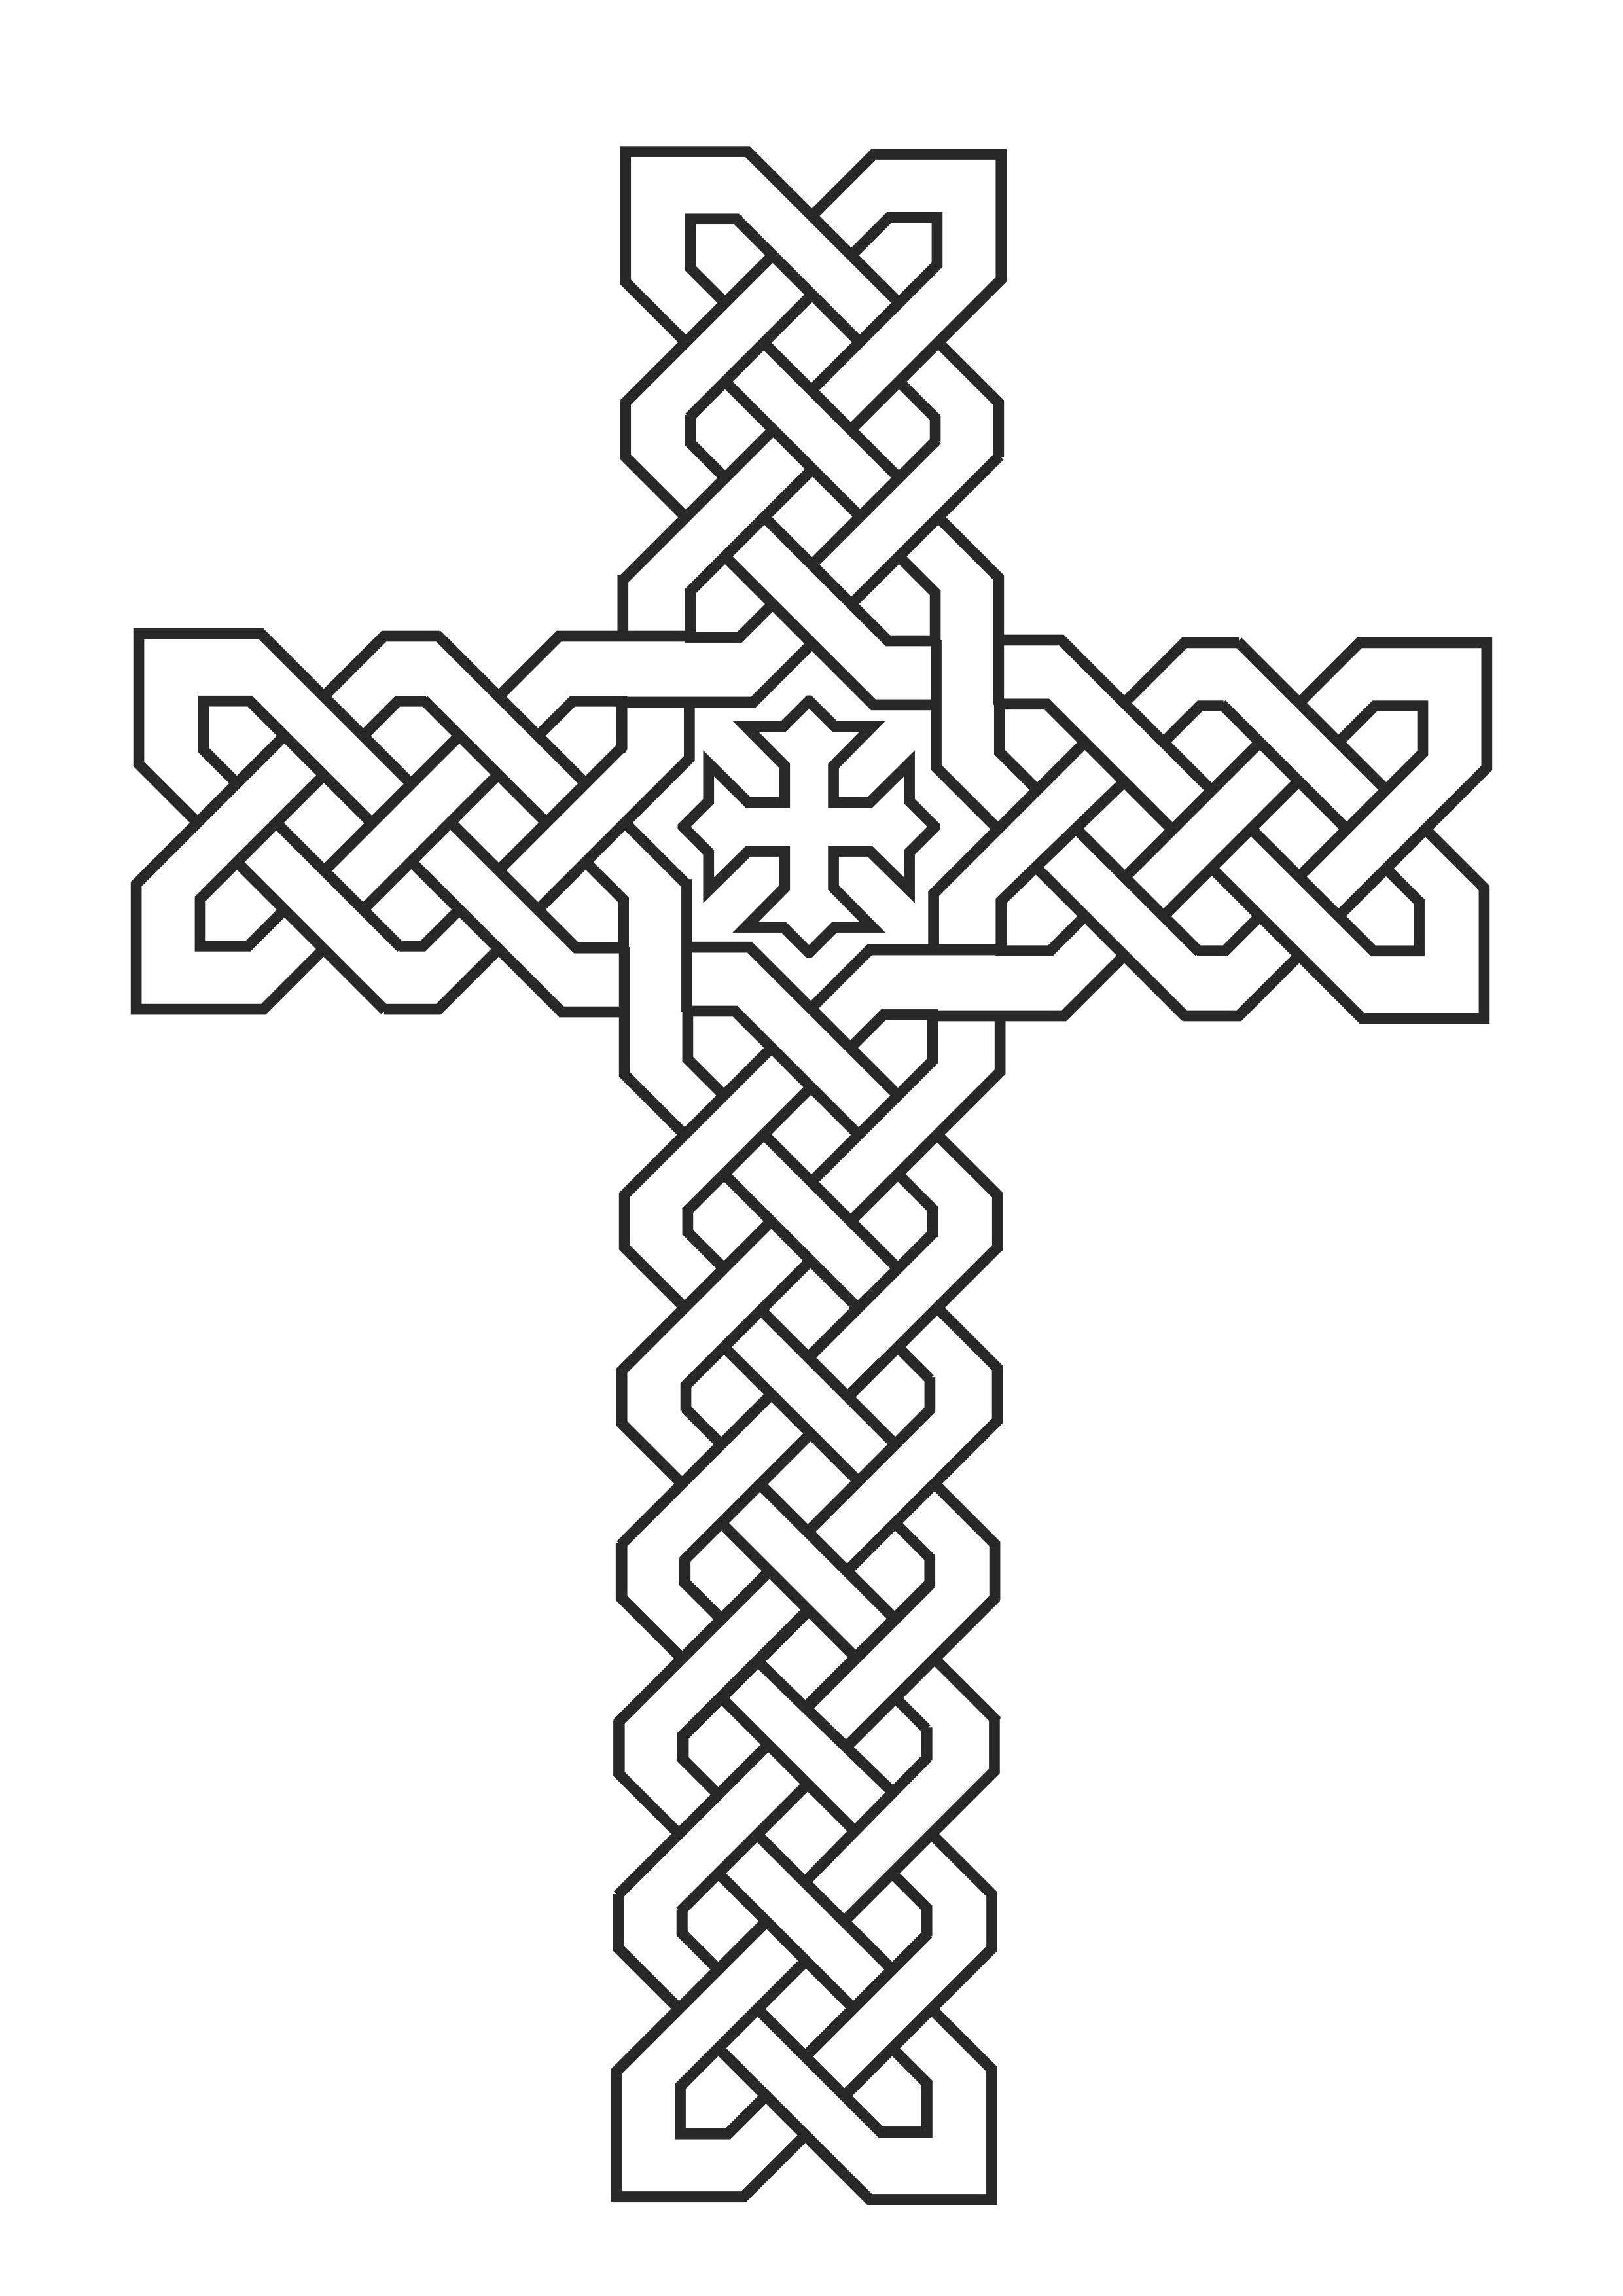 Cross Coloring Pages Coptic Cross موسوعة صور القديسين للتلوين